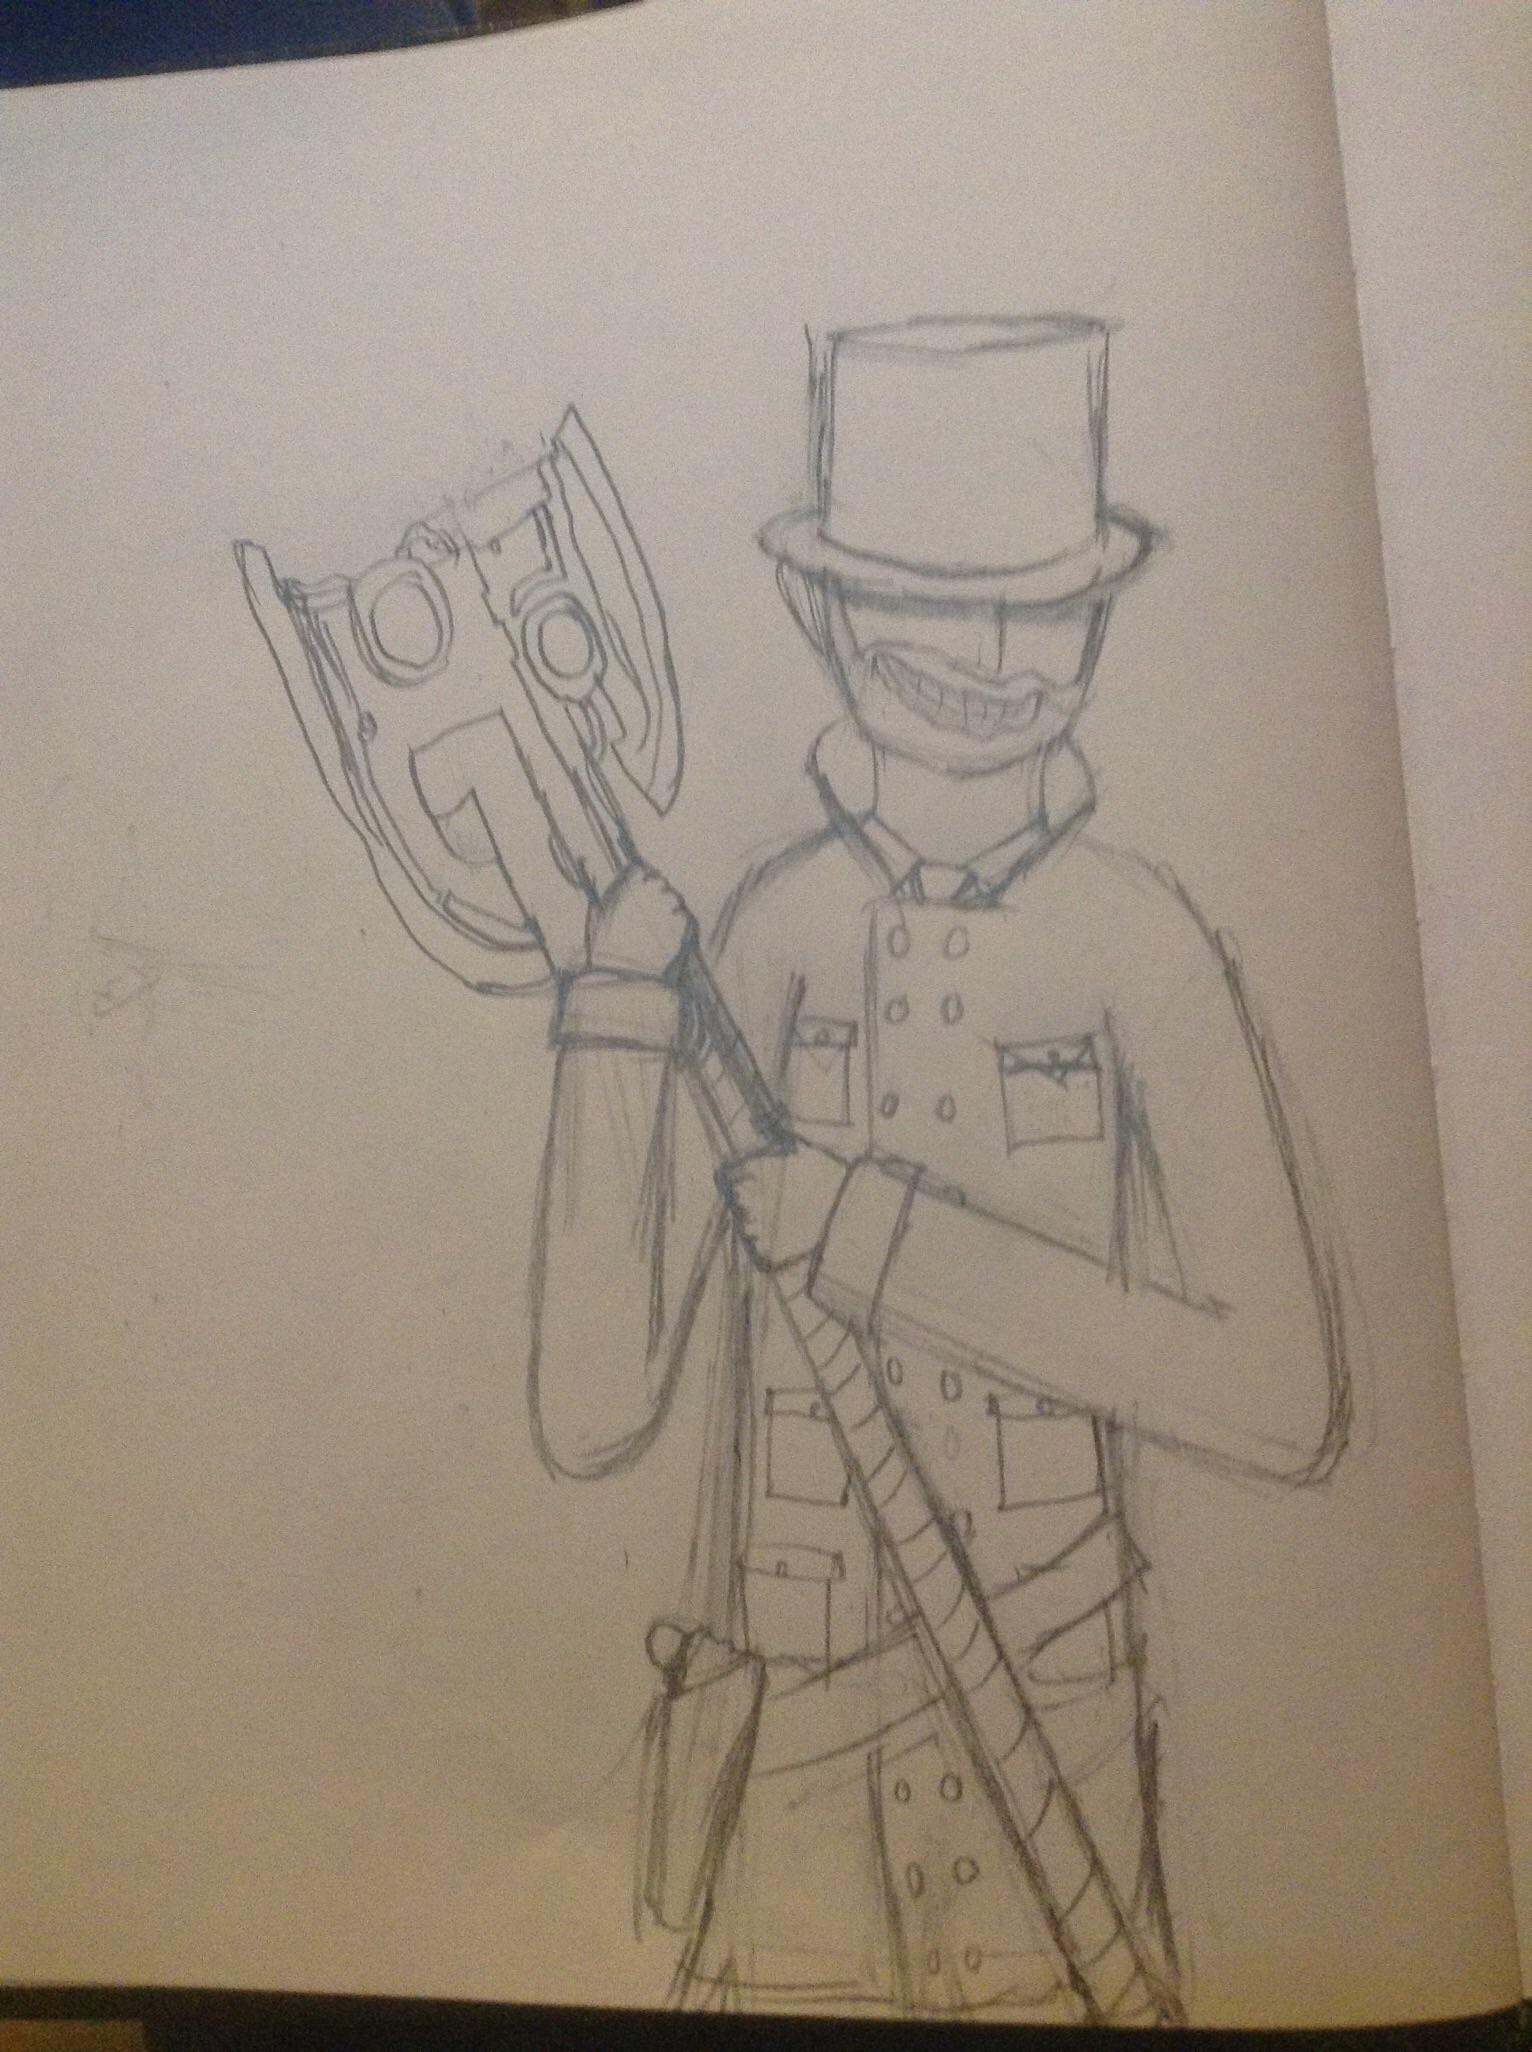 Proof I drew something